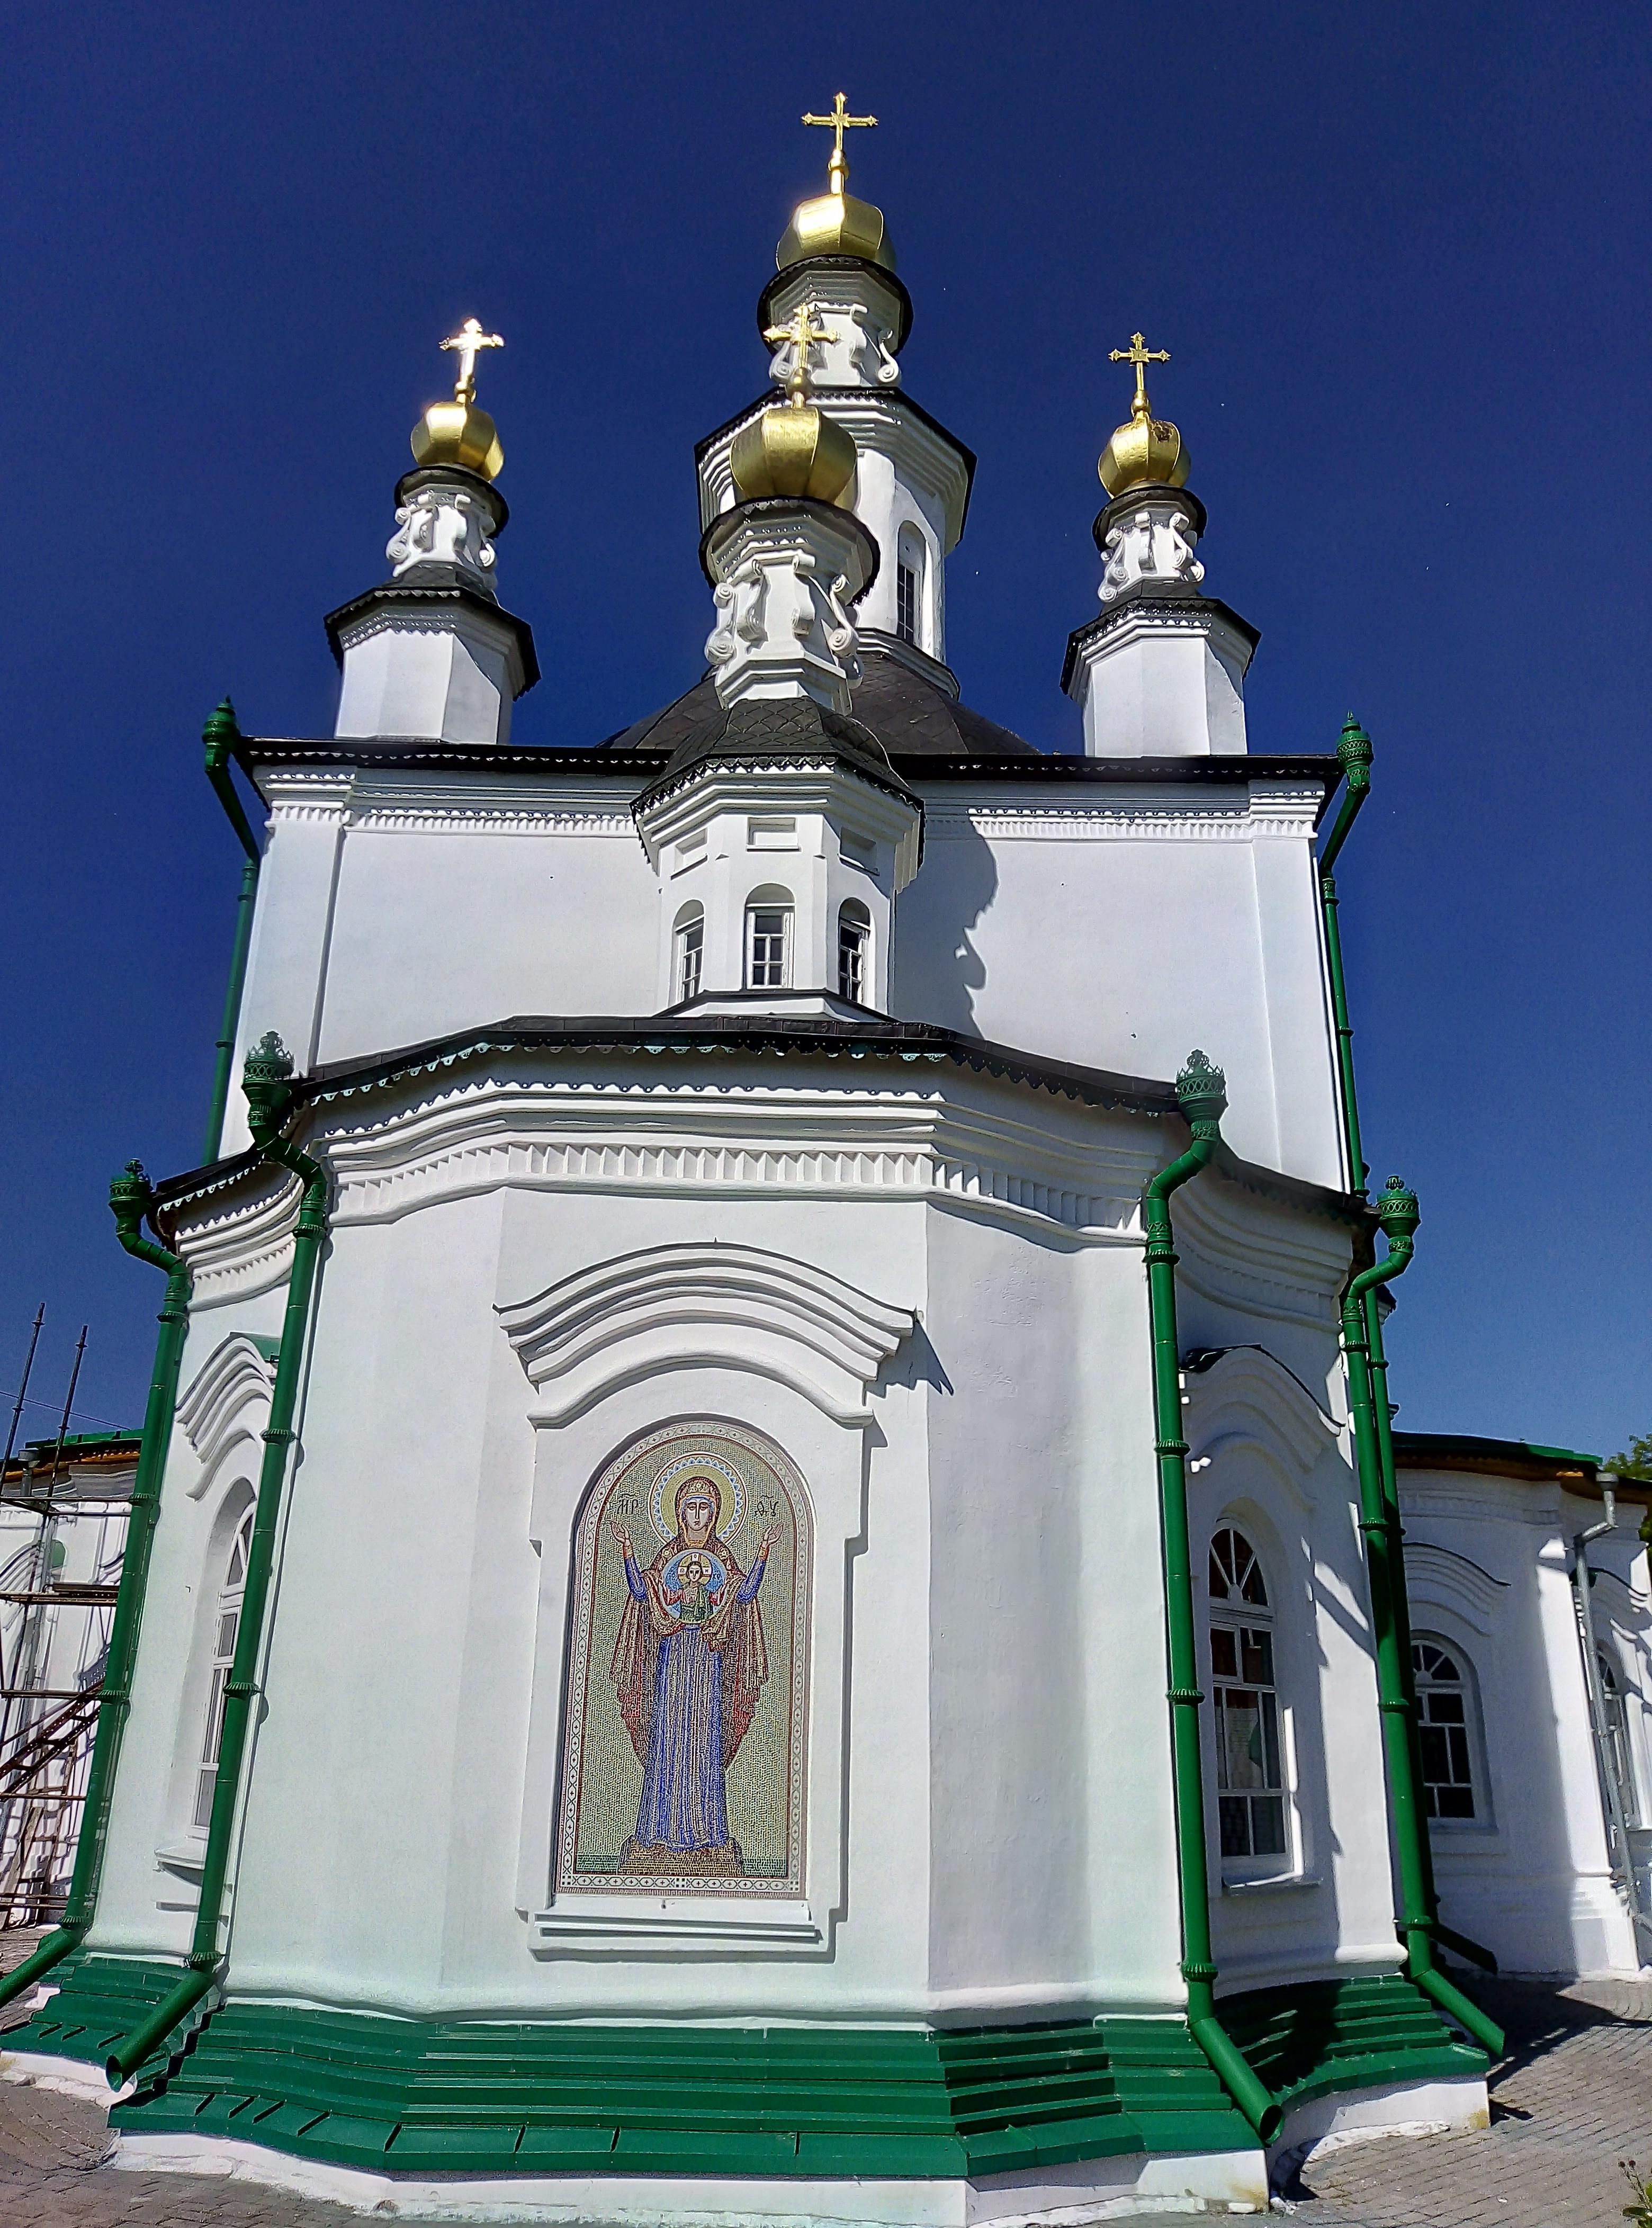 2019 06 27 10 06 24 - Rússia-Tomsk e as igrejas